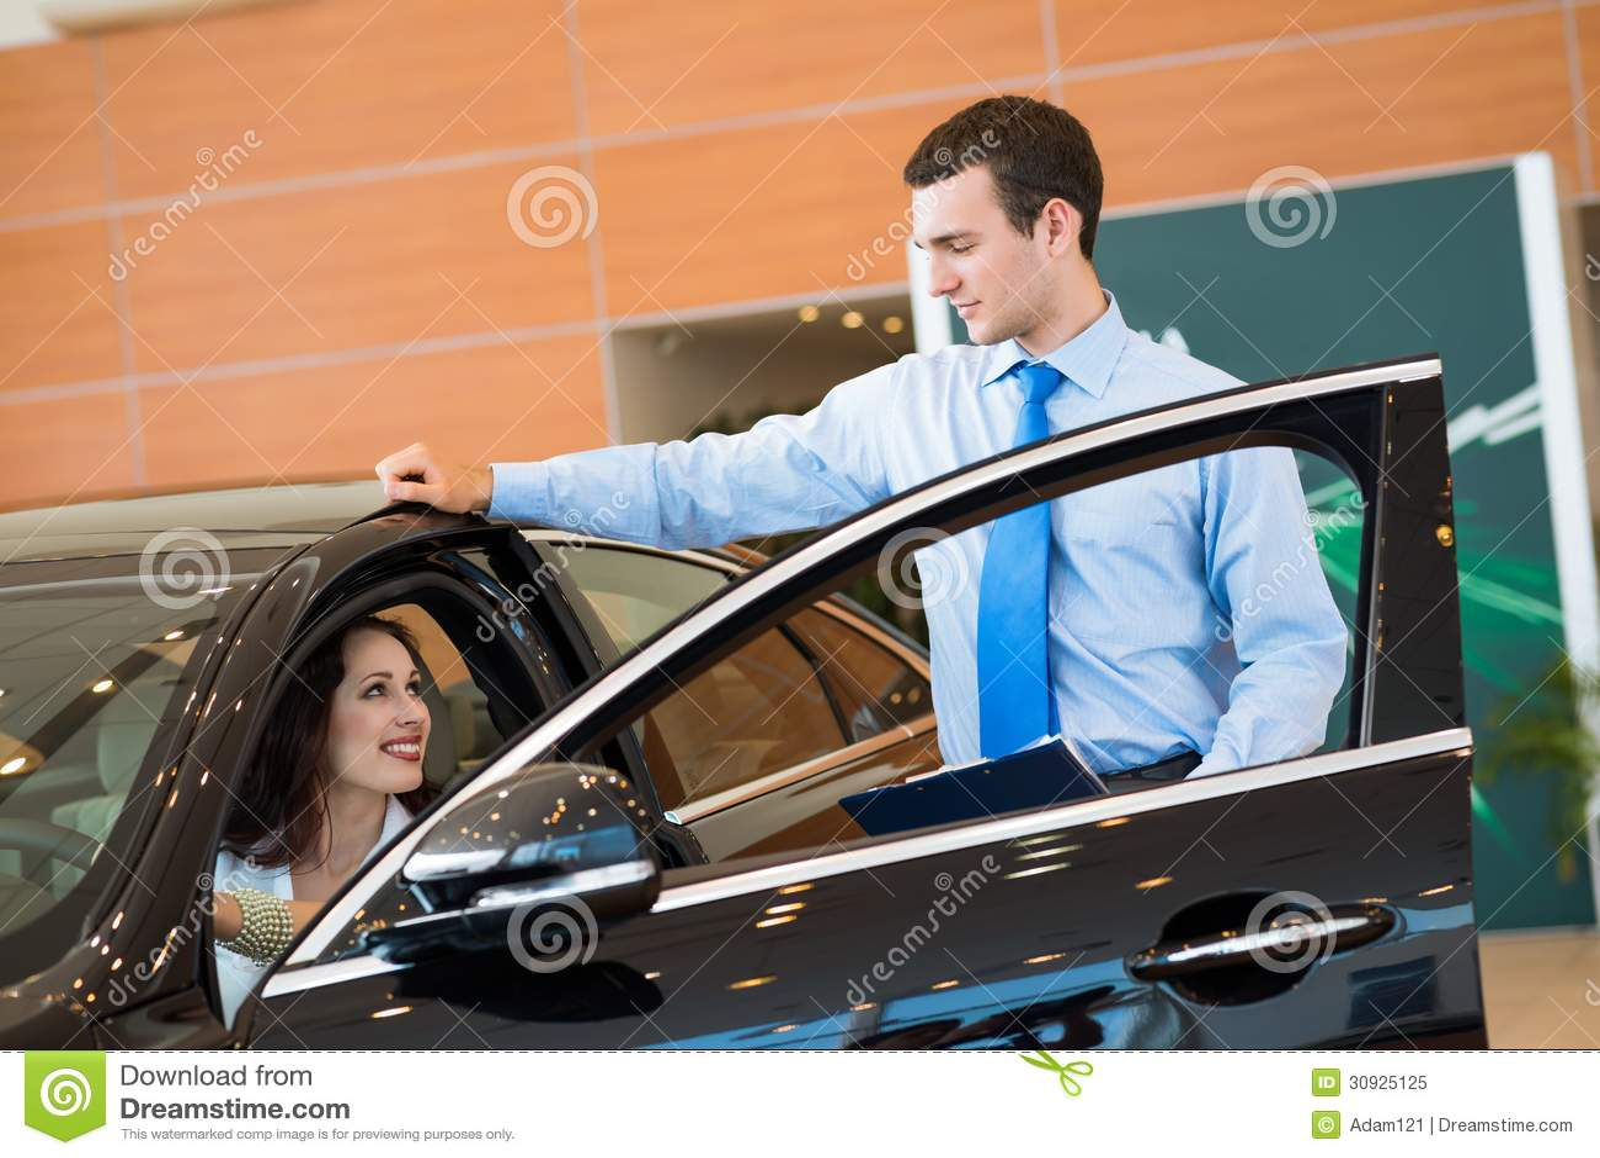 Sales Consultant In Car Showroom